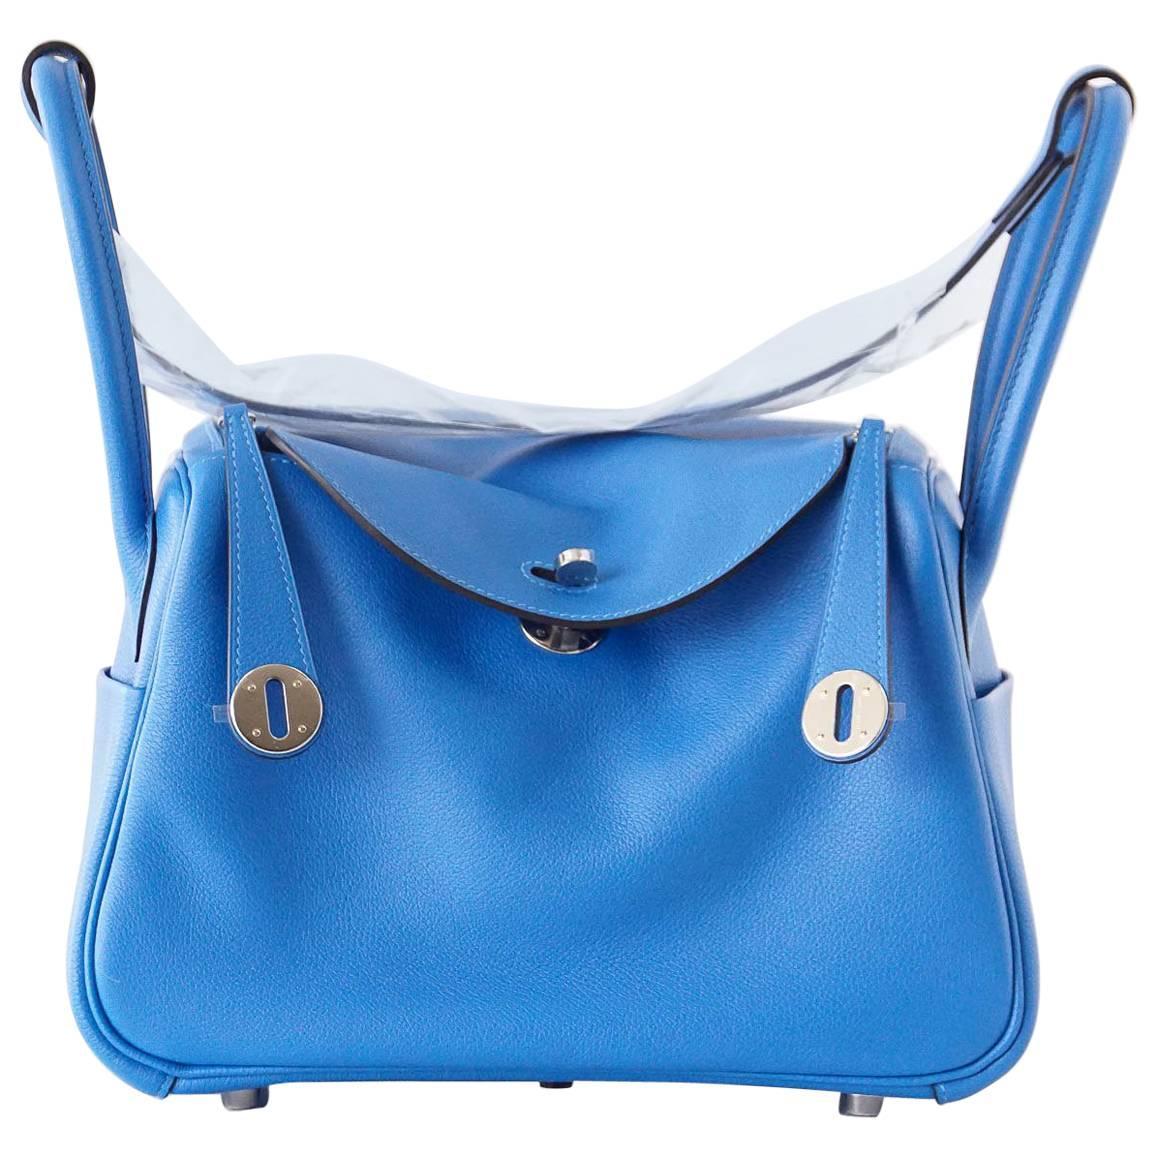 ... hot hermes lindy 26 beautiful blue hydra evercolor leather palladium  for sale e8e2e deac4 ... 7bf1afacb8df2